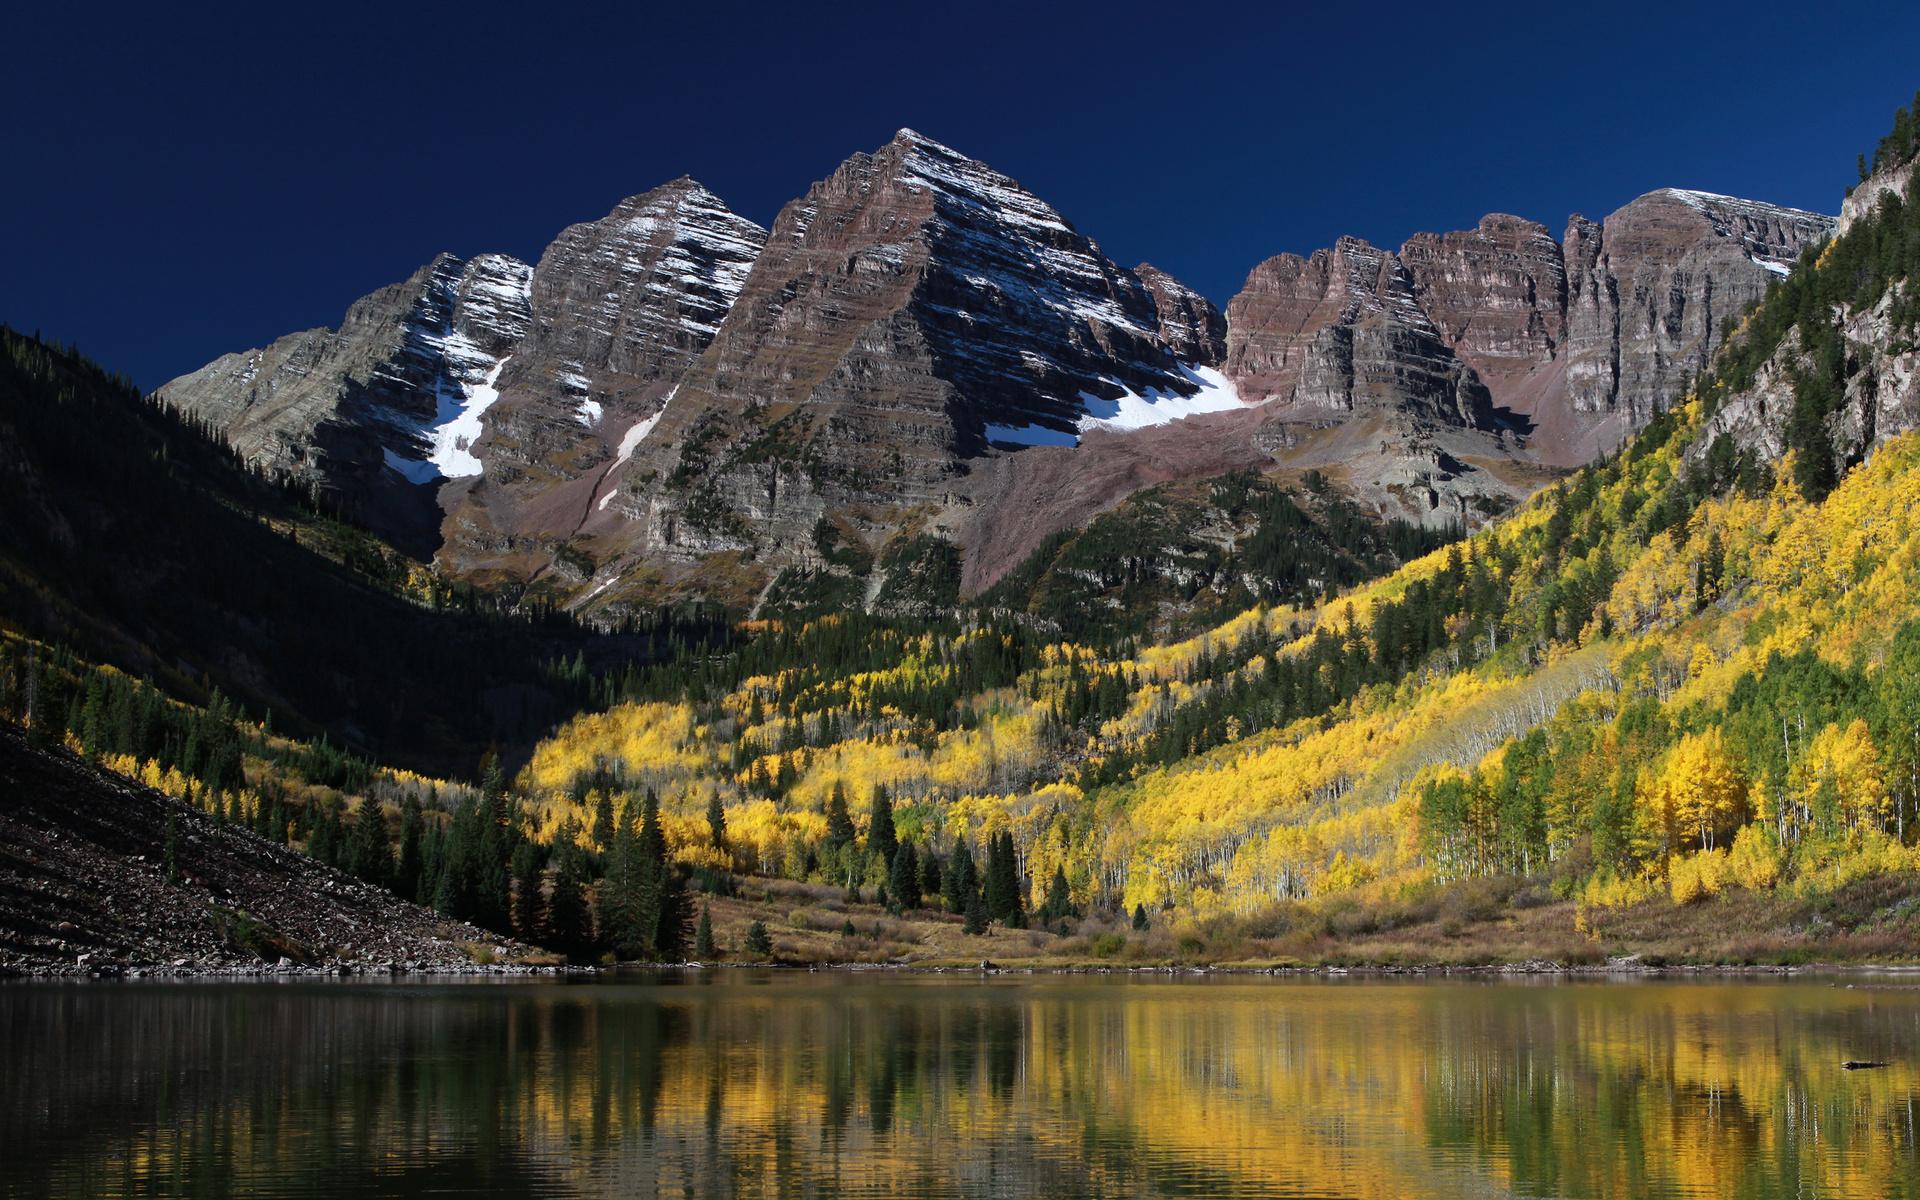 rocks Colorado USA autumn wallpaper 1920x1200 67239 WallpaperUP 1920x1200